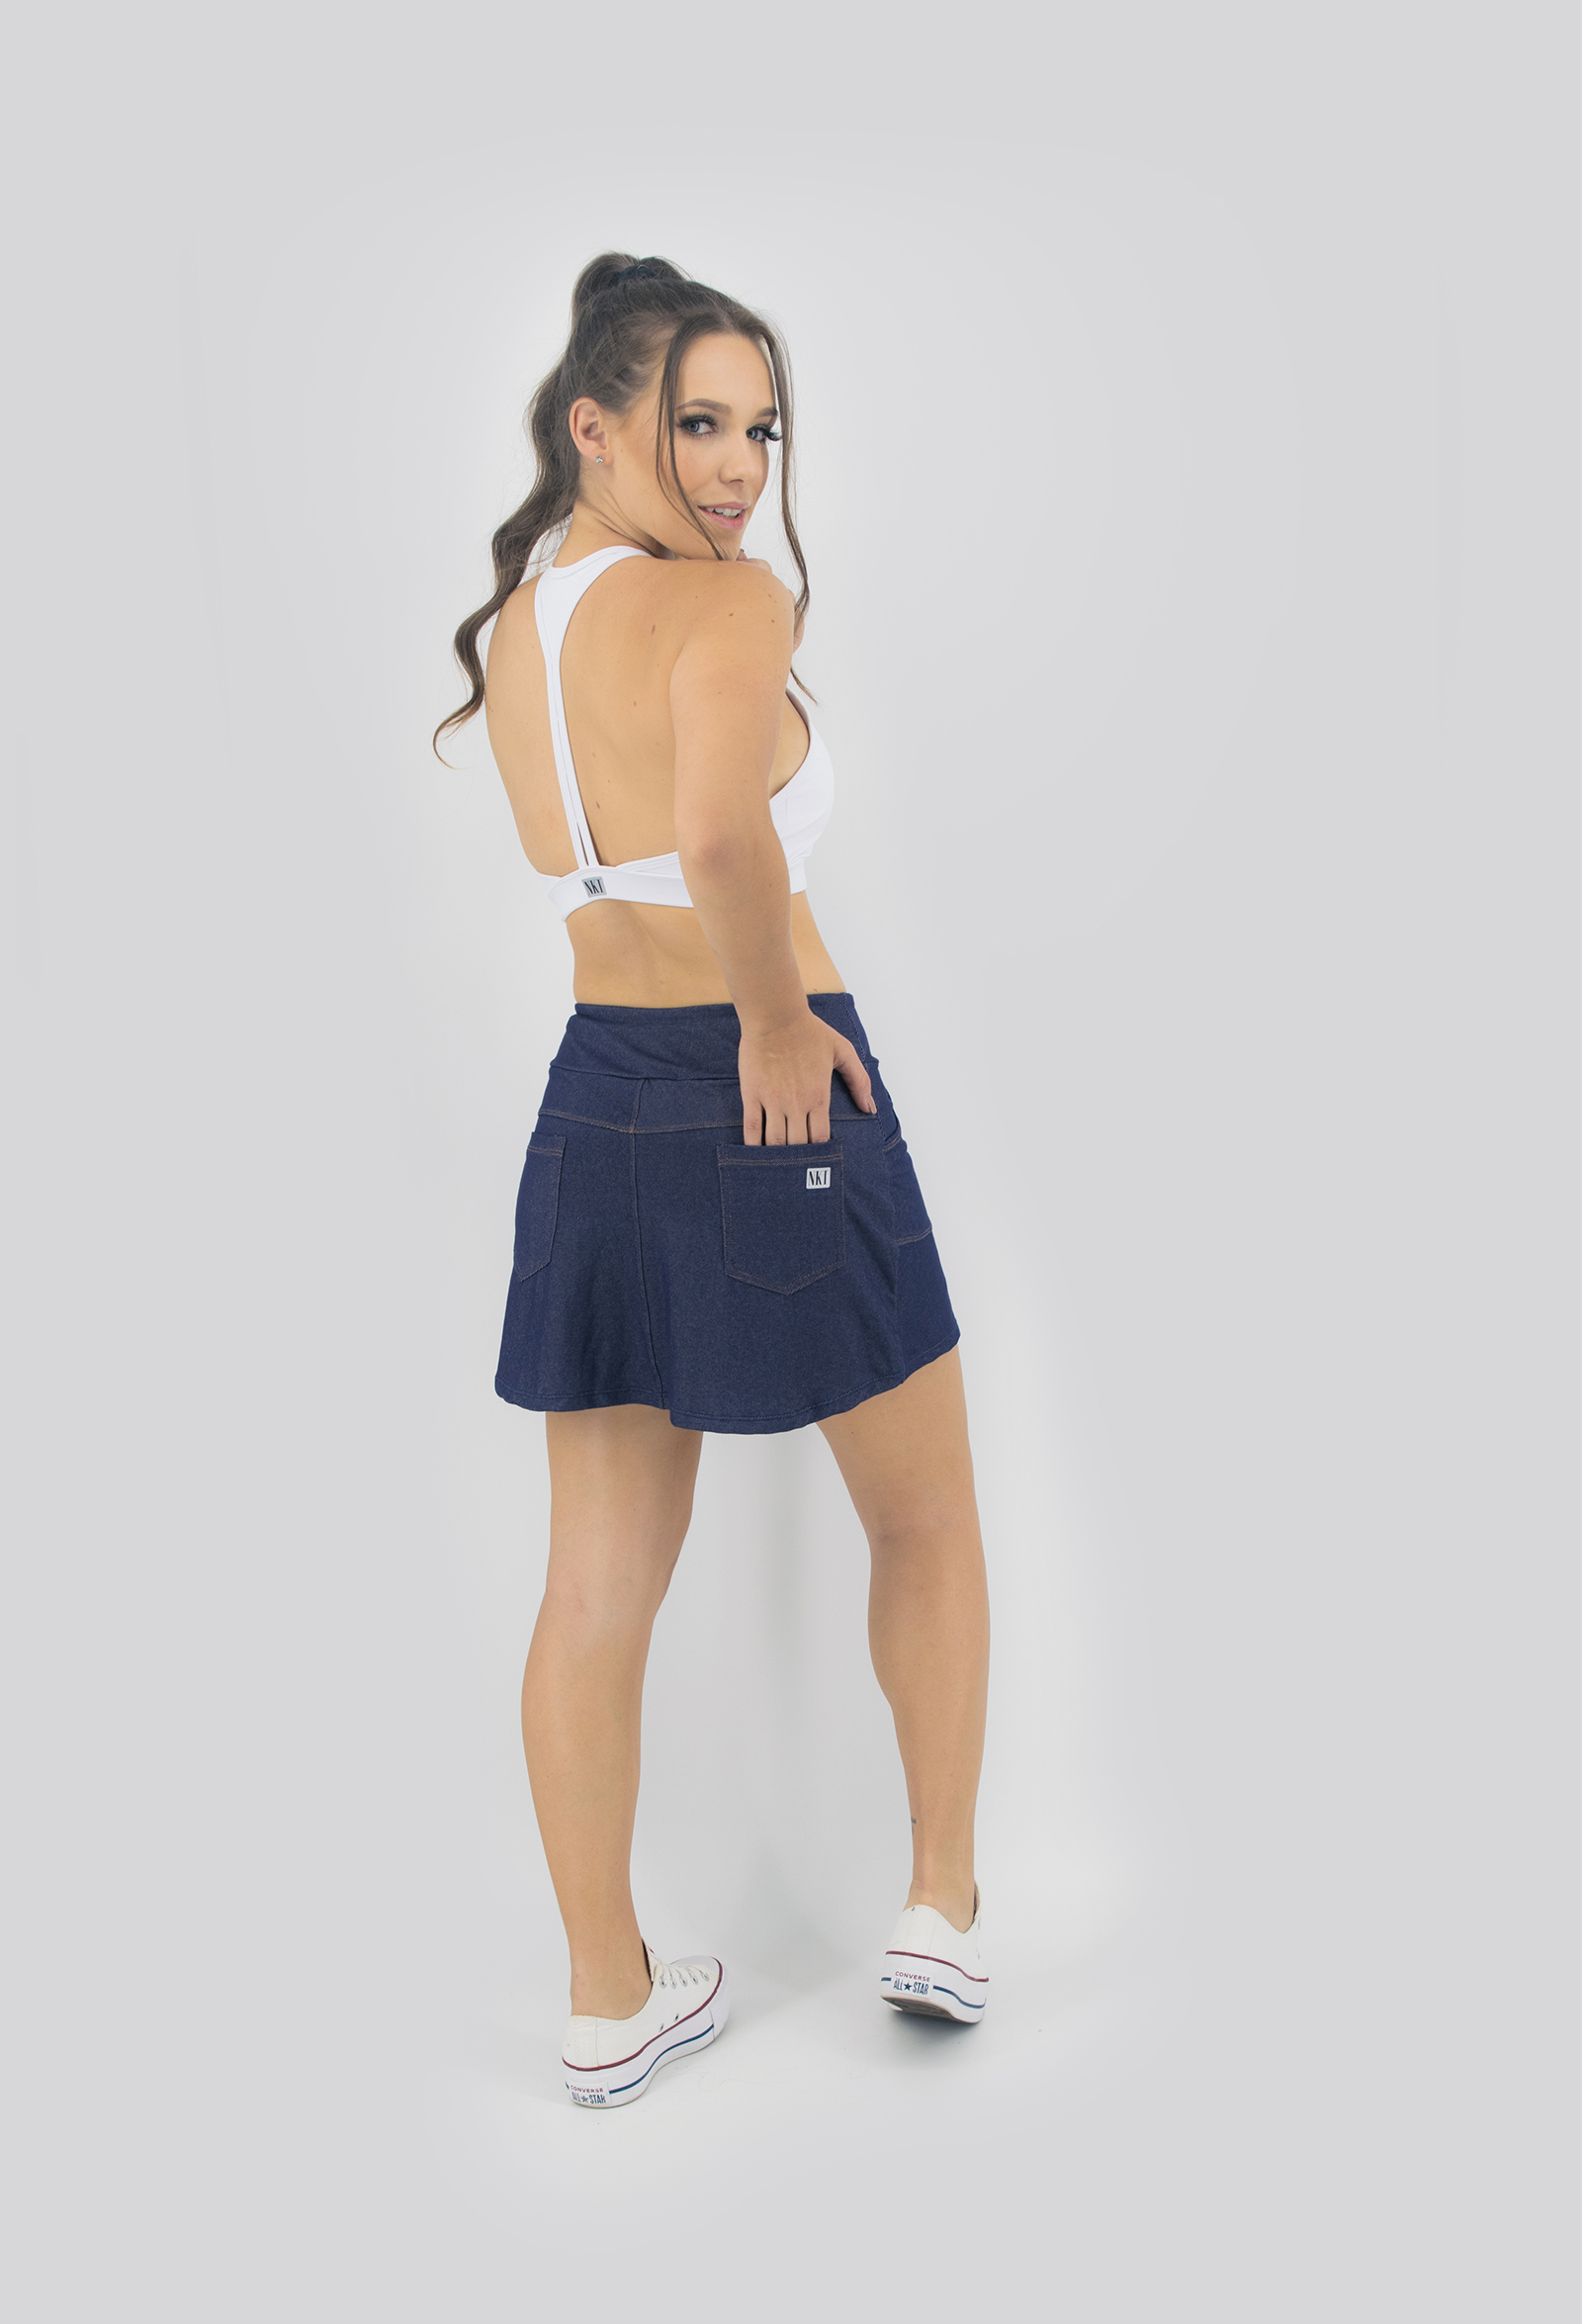 Saia Shorts Fluky Jeans Escuro, Coleção Move Your Body - NKT Fitwear Moda Fitness